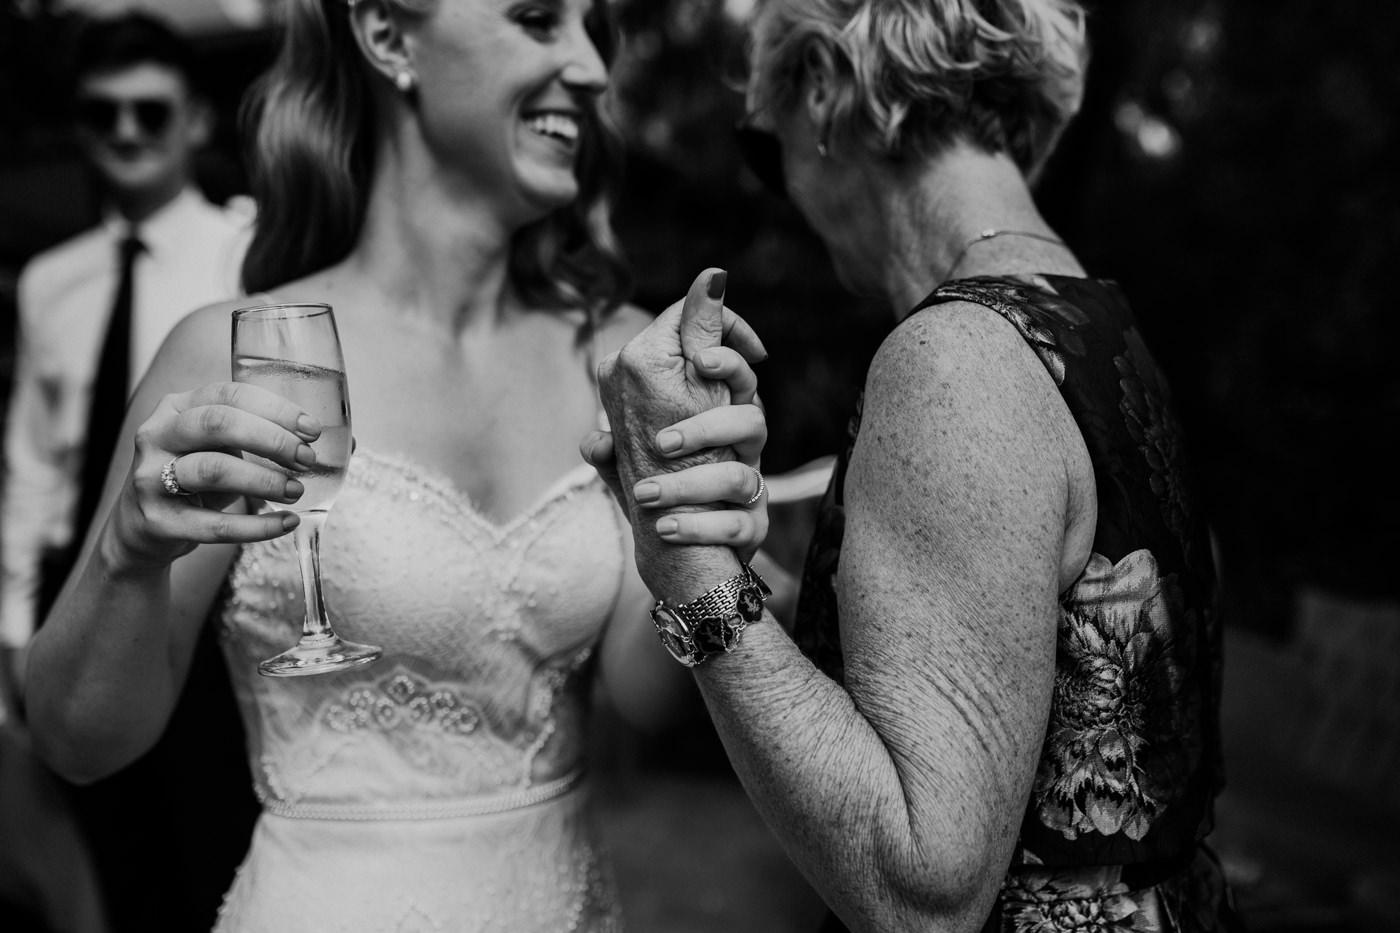 Anthony & Eliet - Wagga Wagga Wedding - Country NSW - Samantha Heather Photography-112.jpg